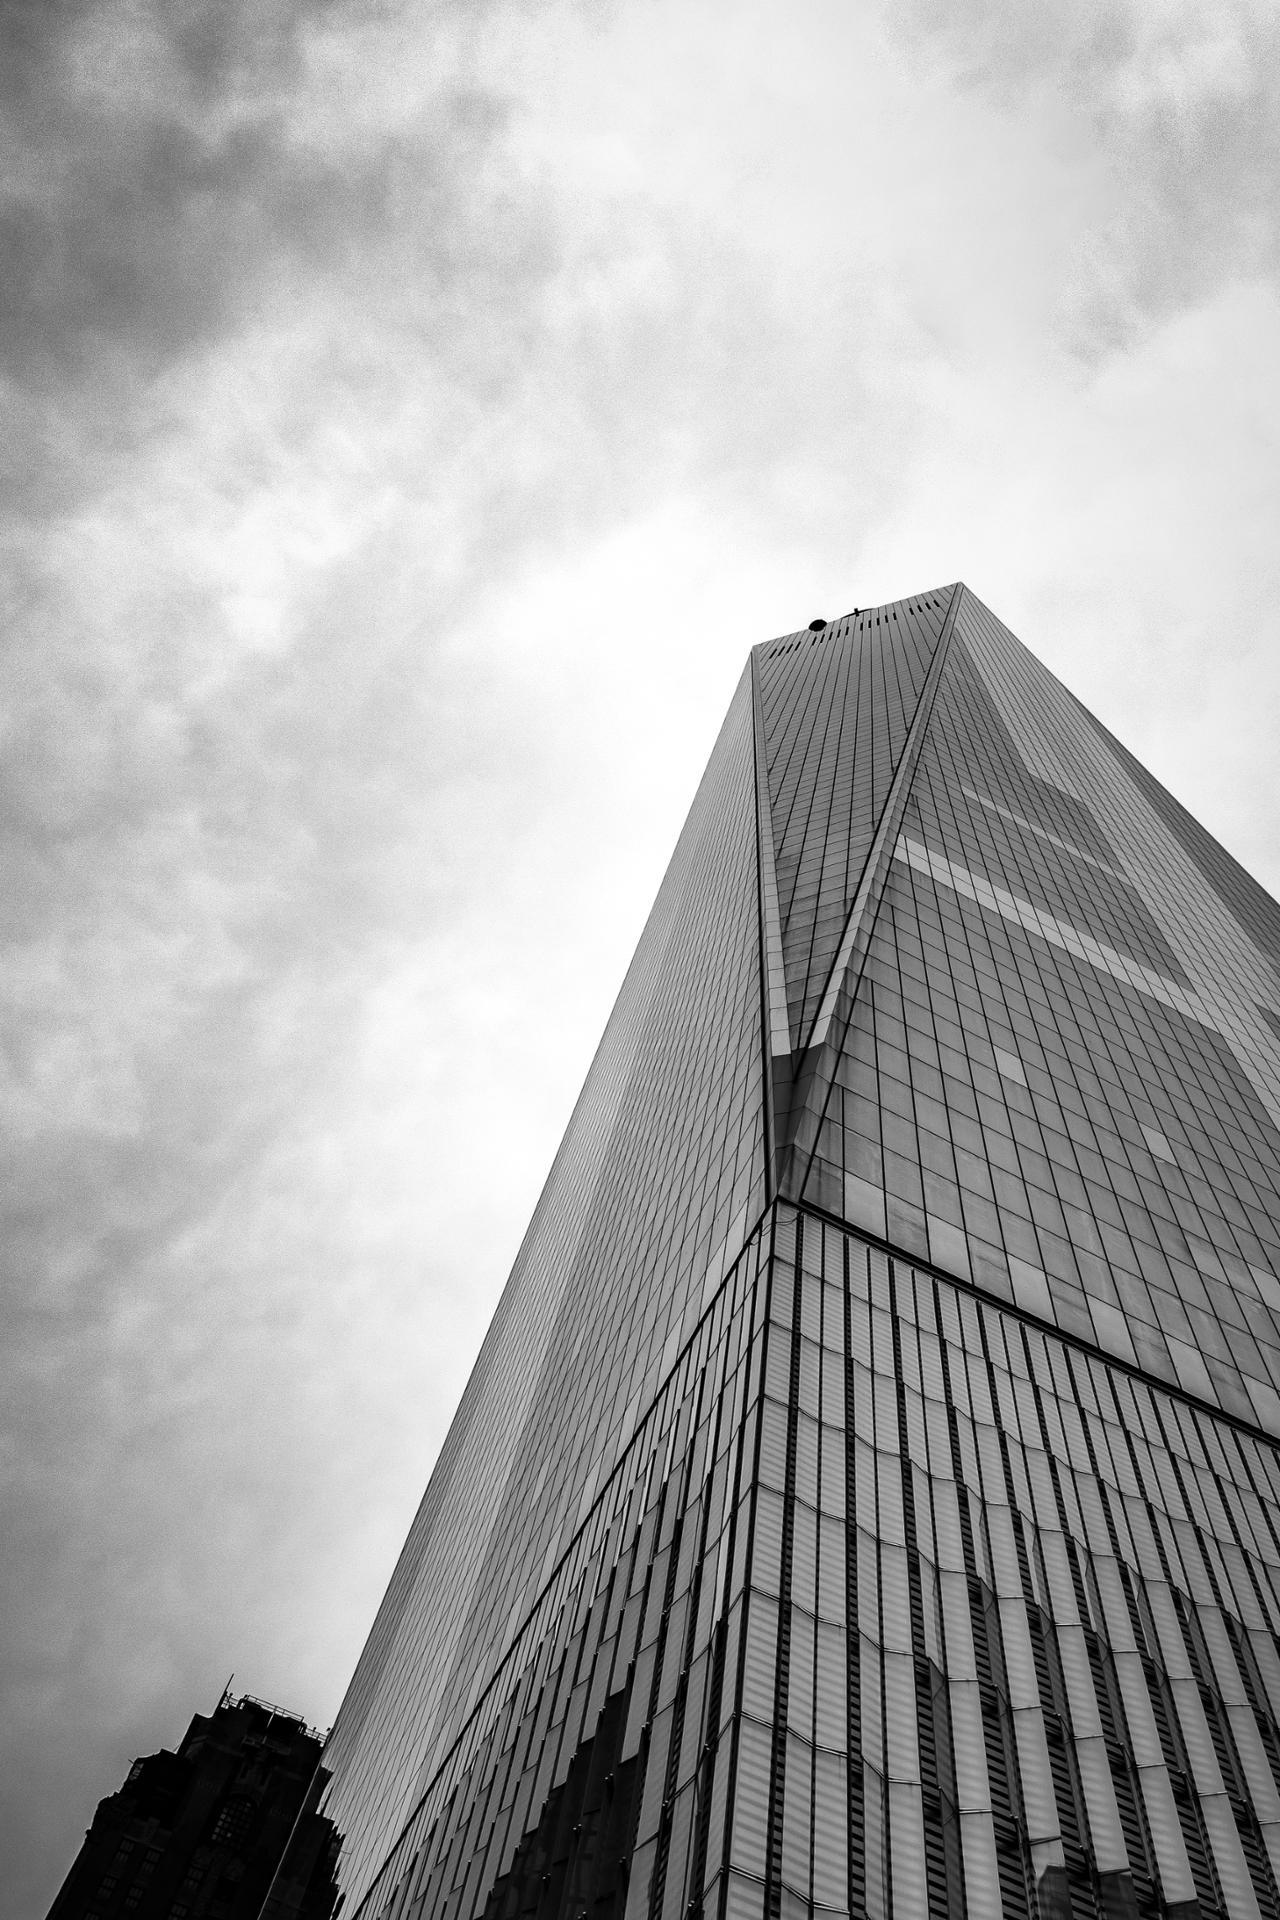 NYC One World Trade Center